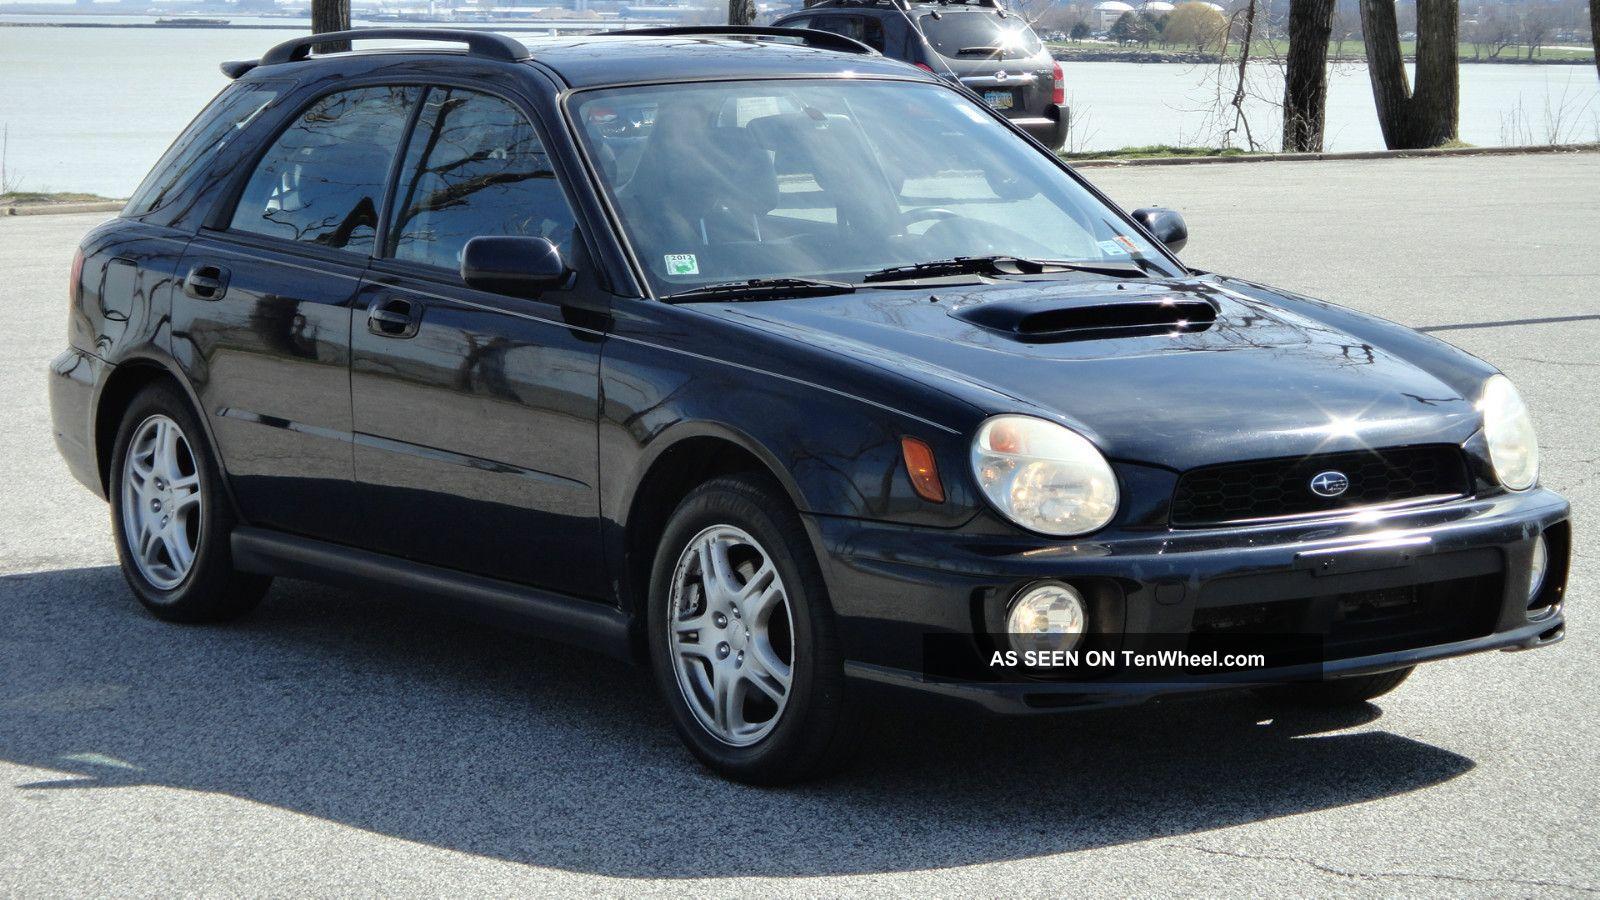 2003 Subaru Impreza Wrx Sport Wagon 4 Dr 2 0l Turbo Awd Manual Ford Taurus